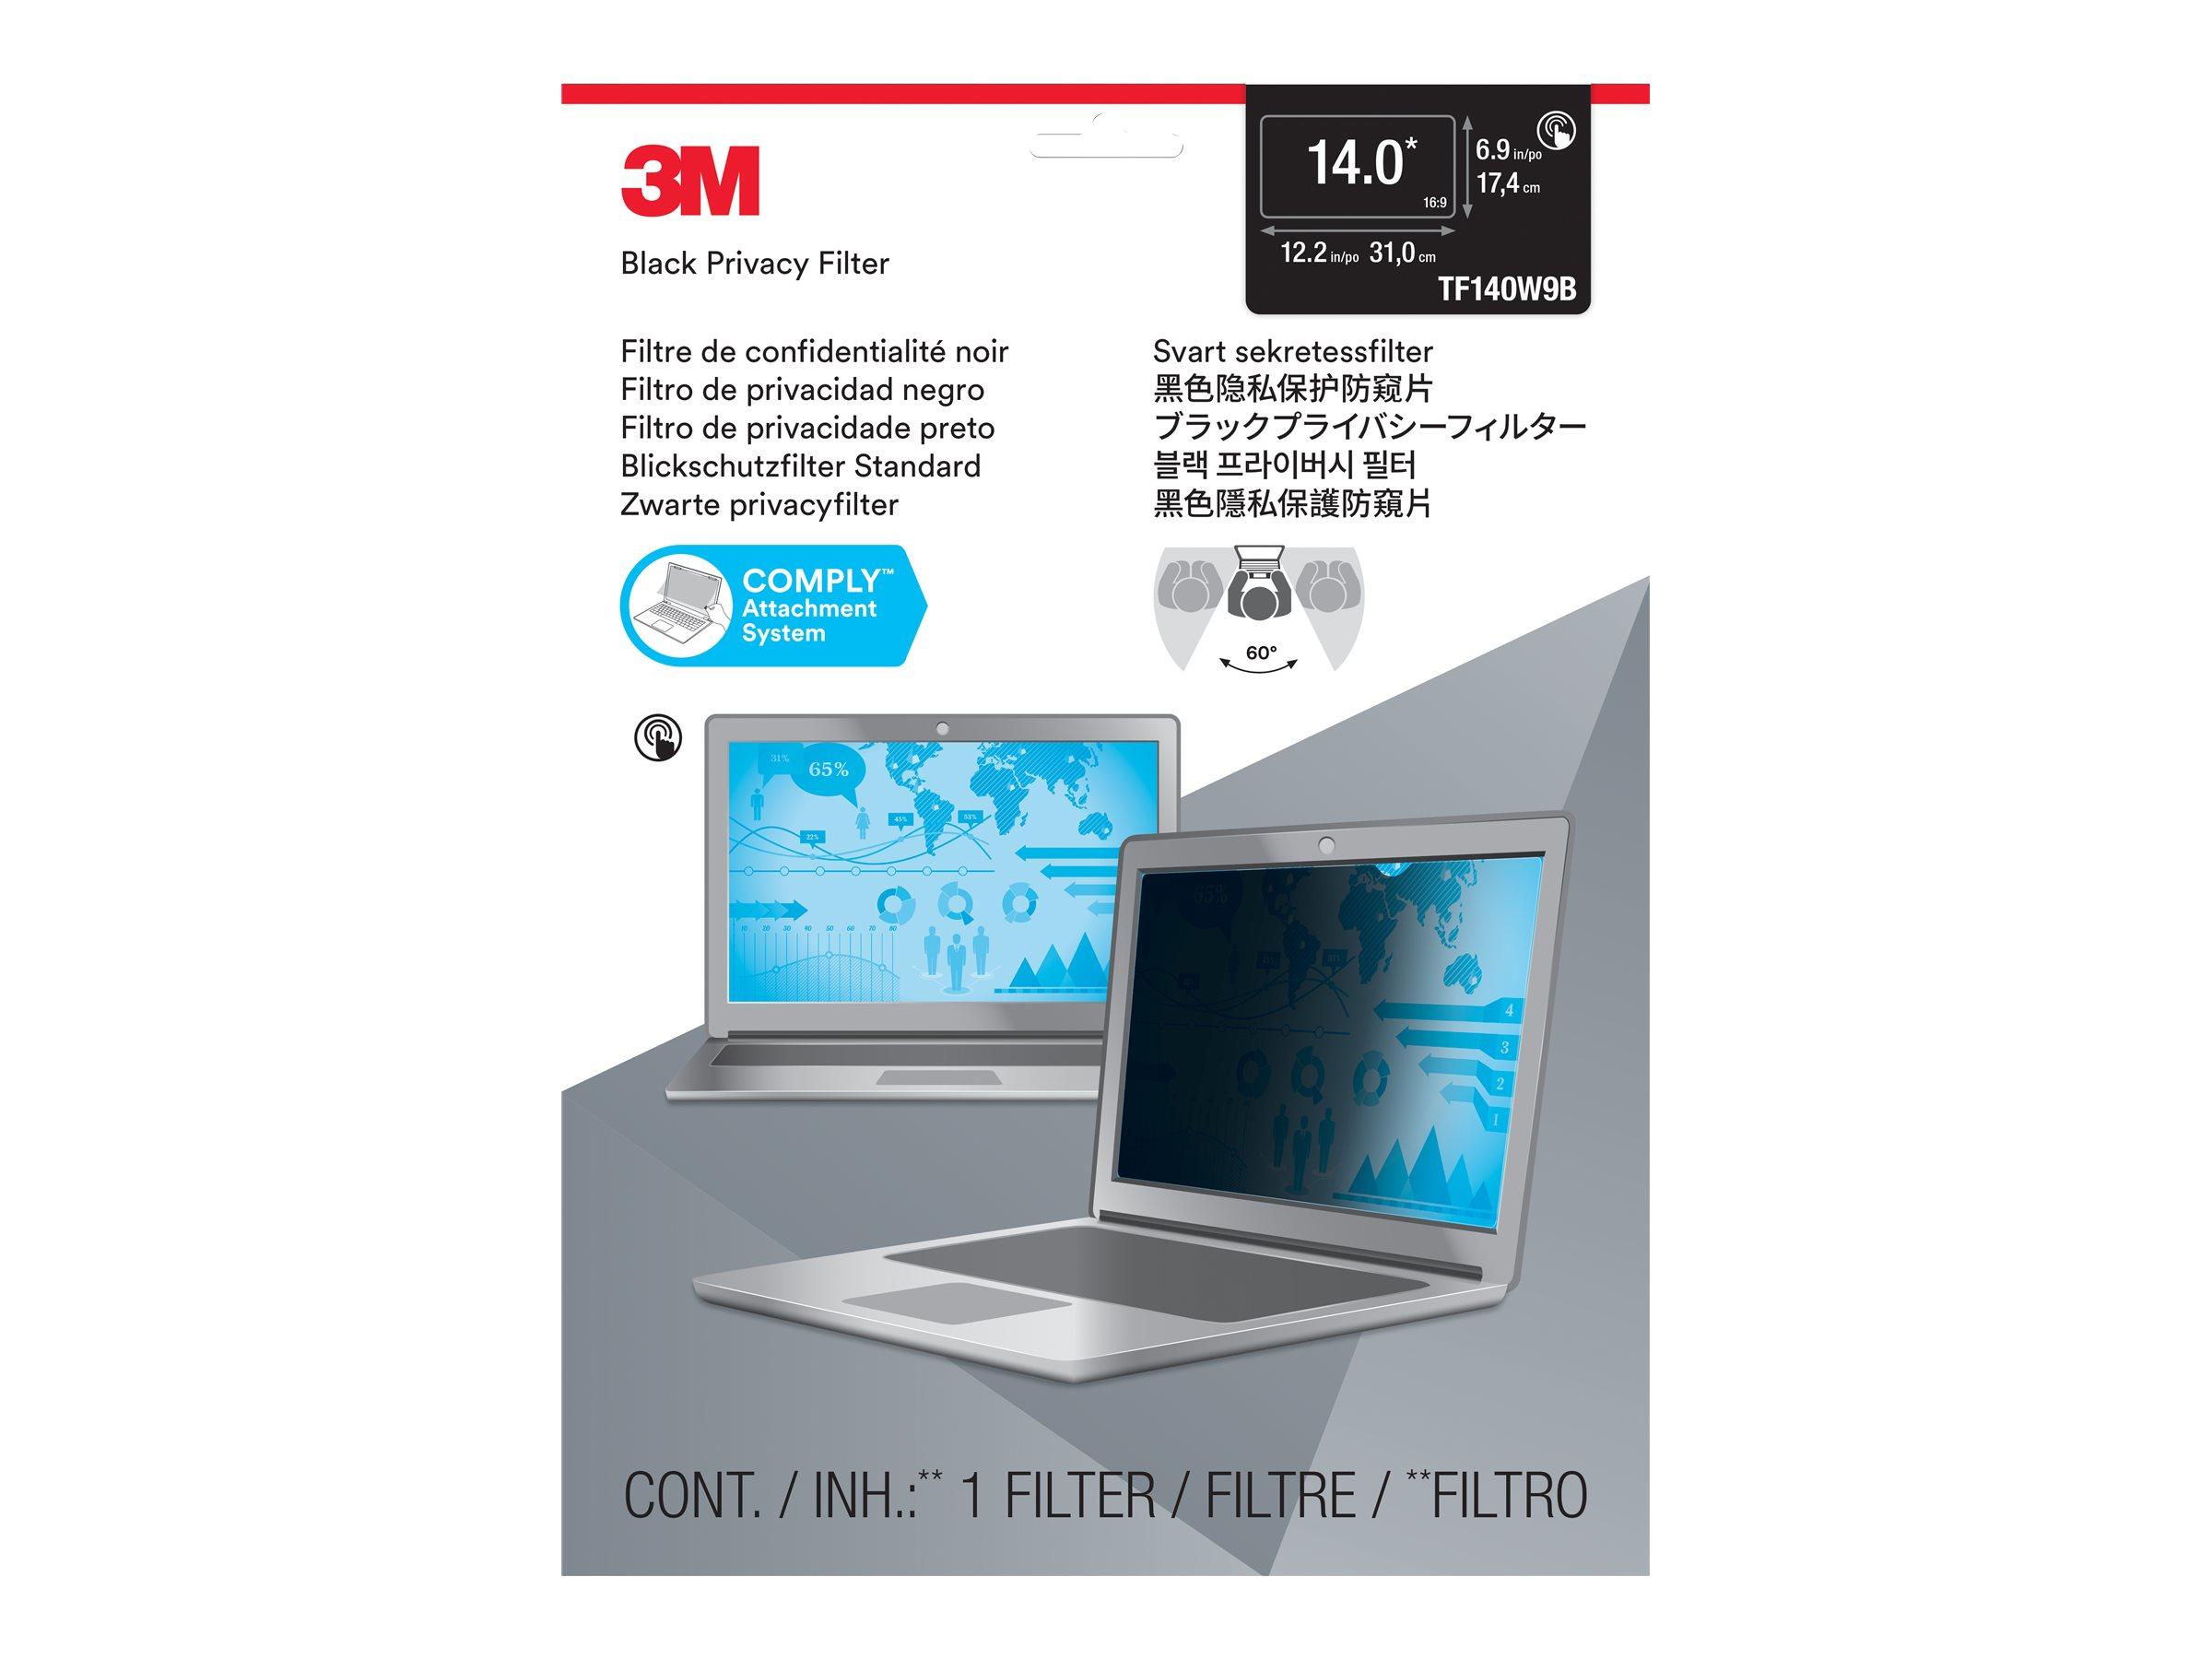 "3M Blickschutzfilter für Touch-Laptops TF140W9B for 14.0"" Widescreen Laptop - Standard Fit with COMPLY Attachment System - Blickschutzfilter für Notebook - 35.6 cm (14"")"